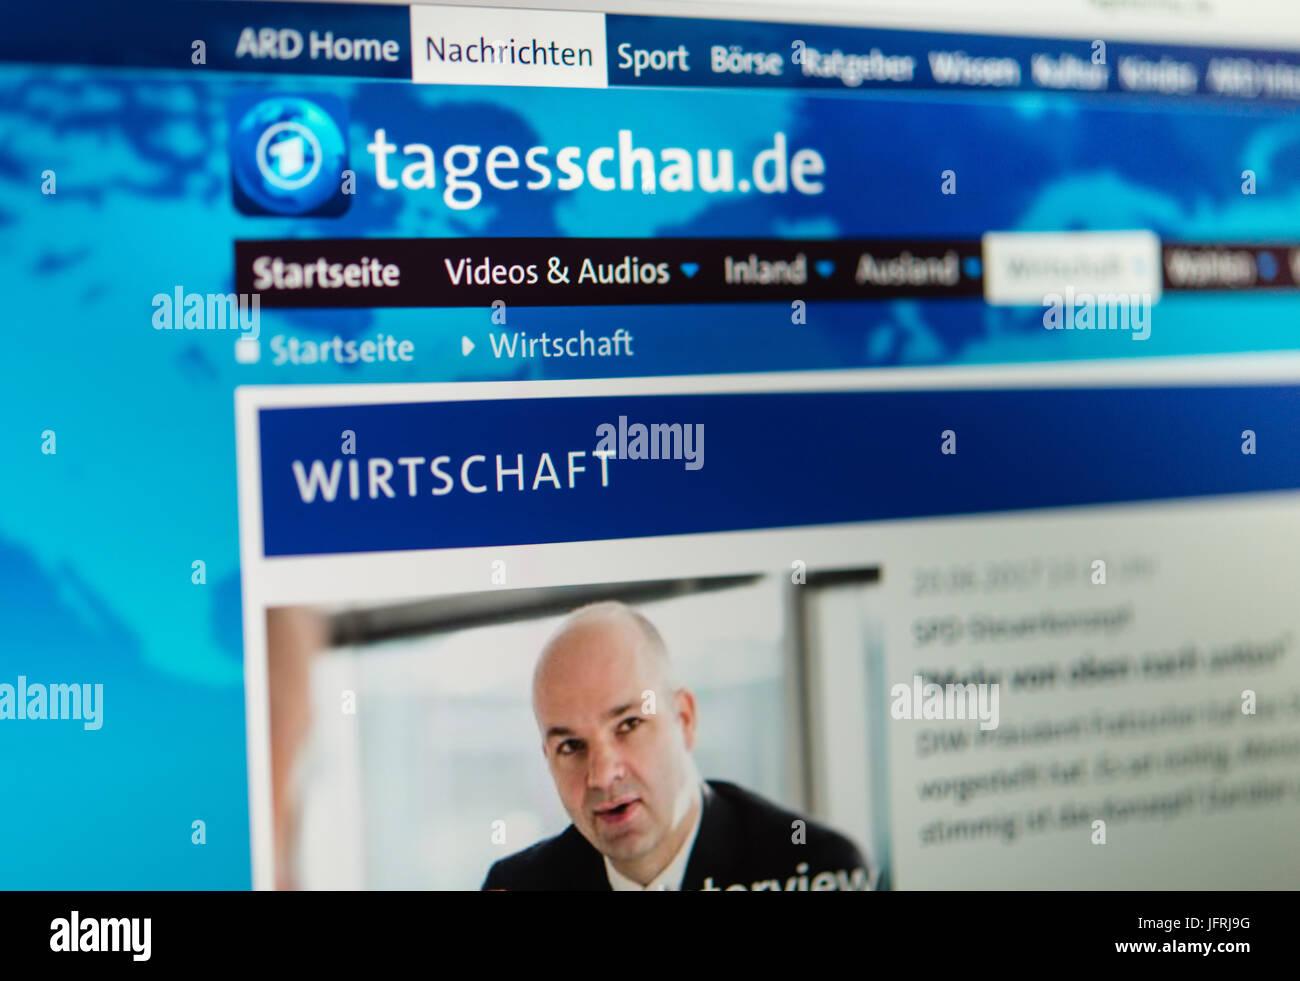 Tagesschau, economics site, internet, screenshot, detail - Stock Image